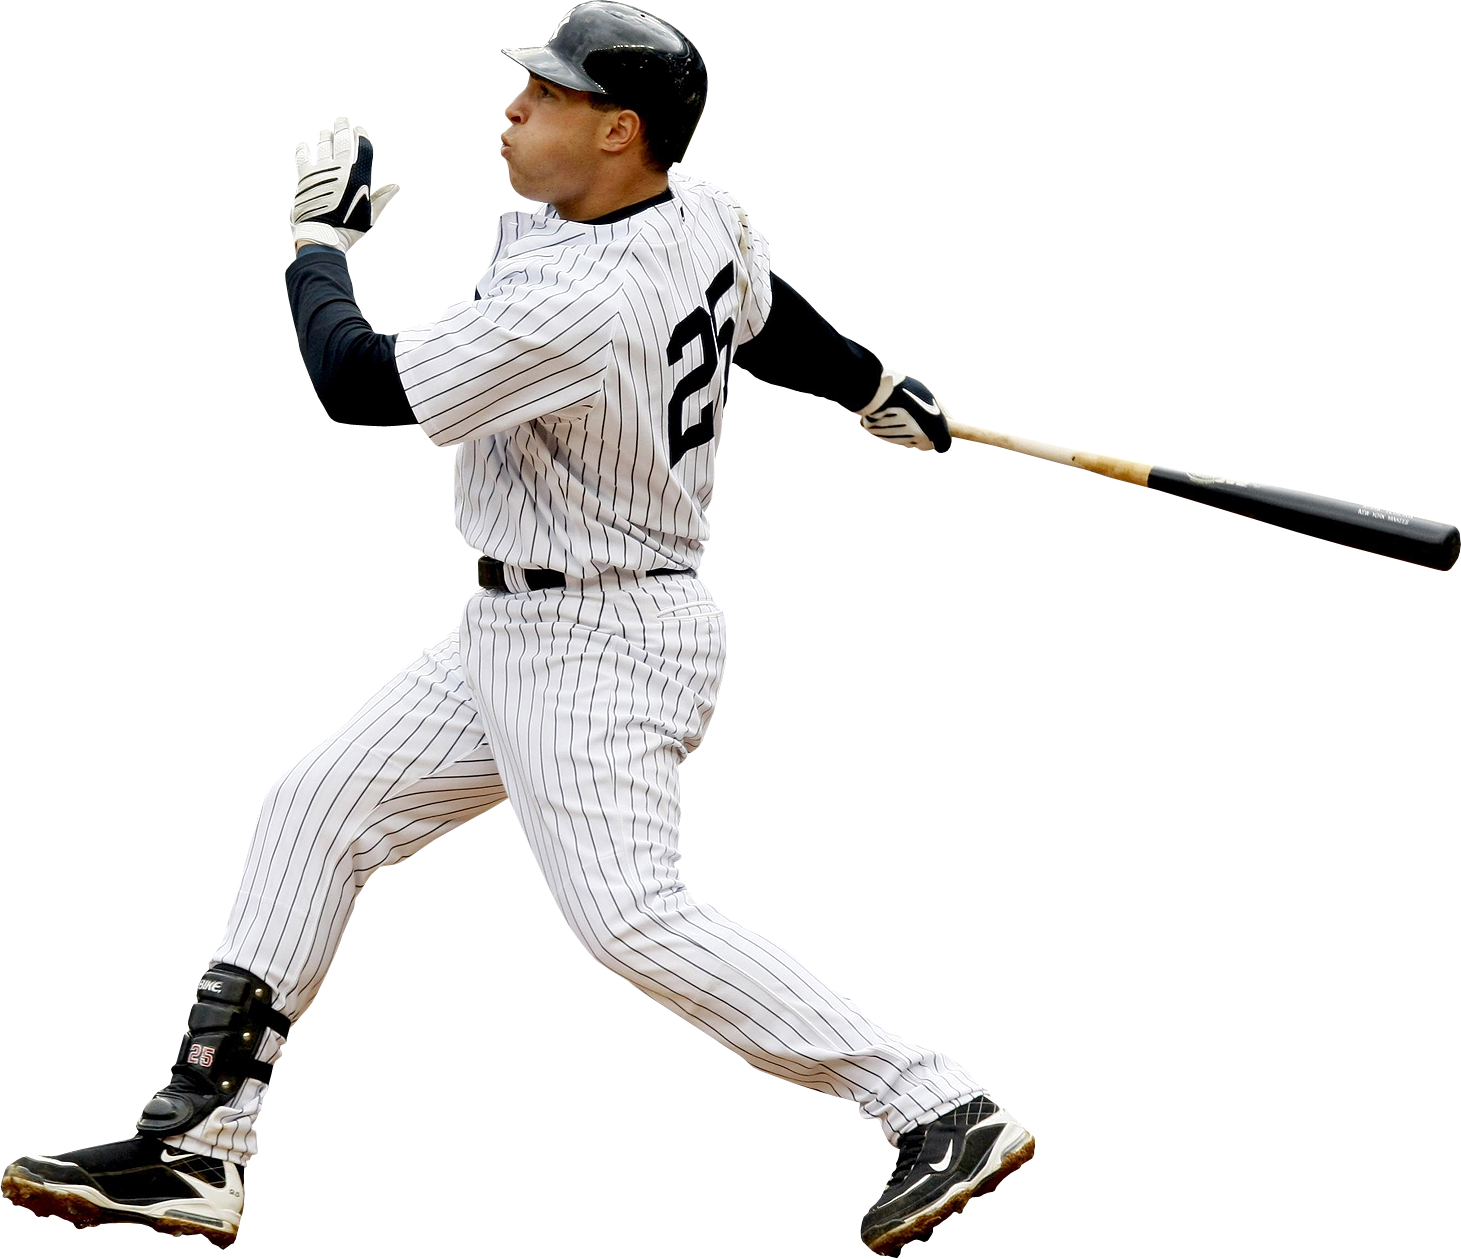 Clipart of baseball player at bat banner Baseball Player PNG Image - PurePNG | Free transparent CC0 PNG Image ... banner